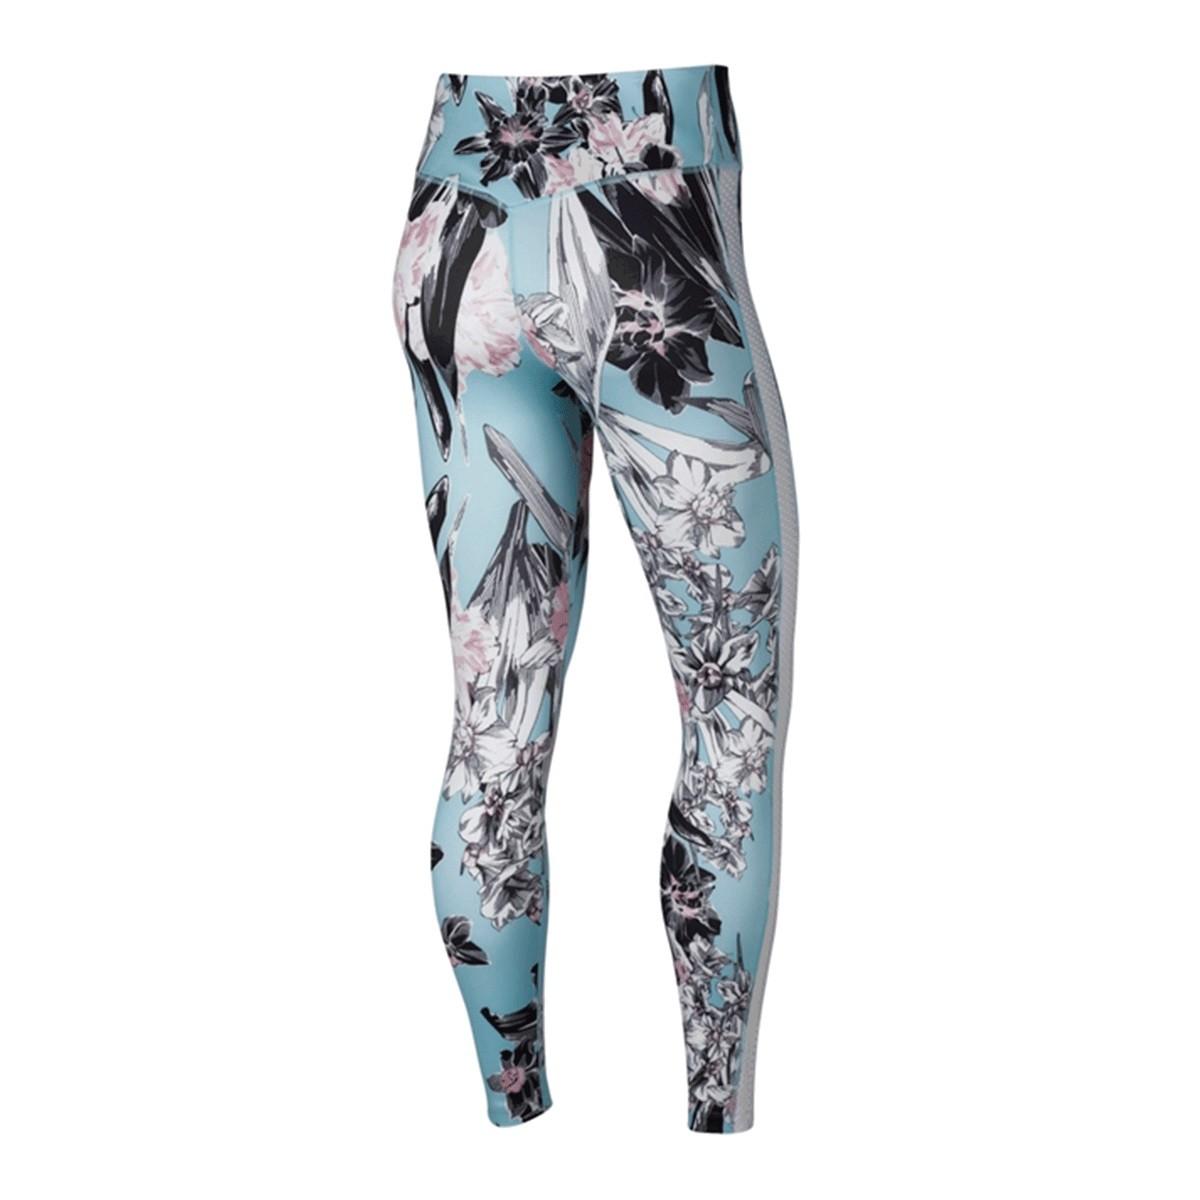 Calça Nike Legging Hyperflora Feminina Preto Azul